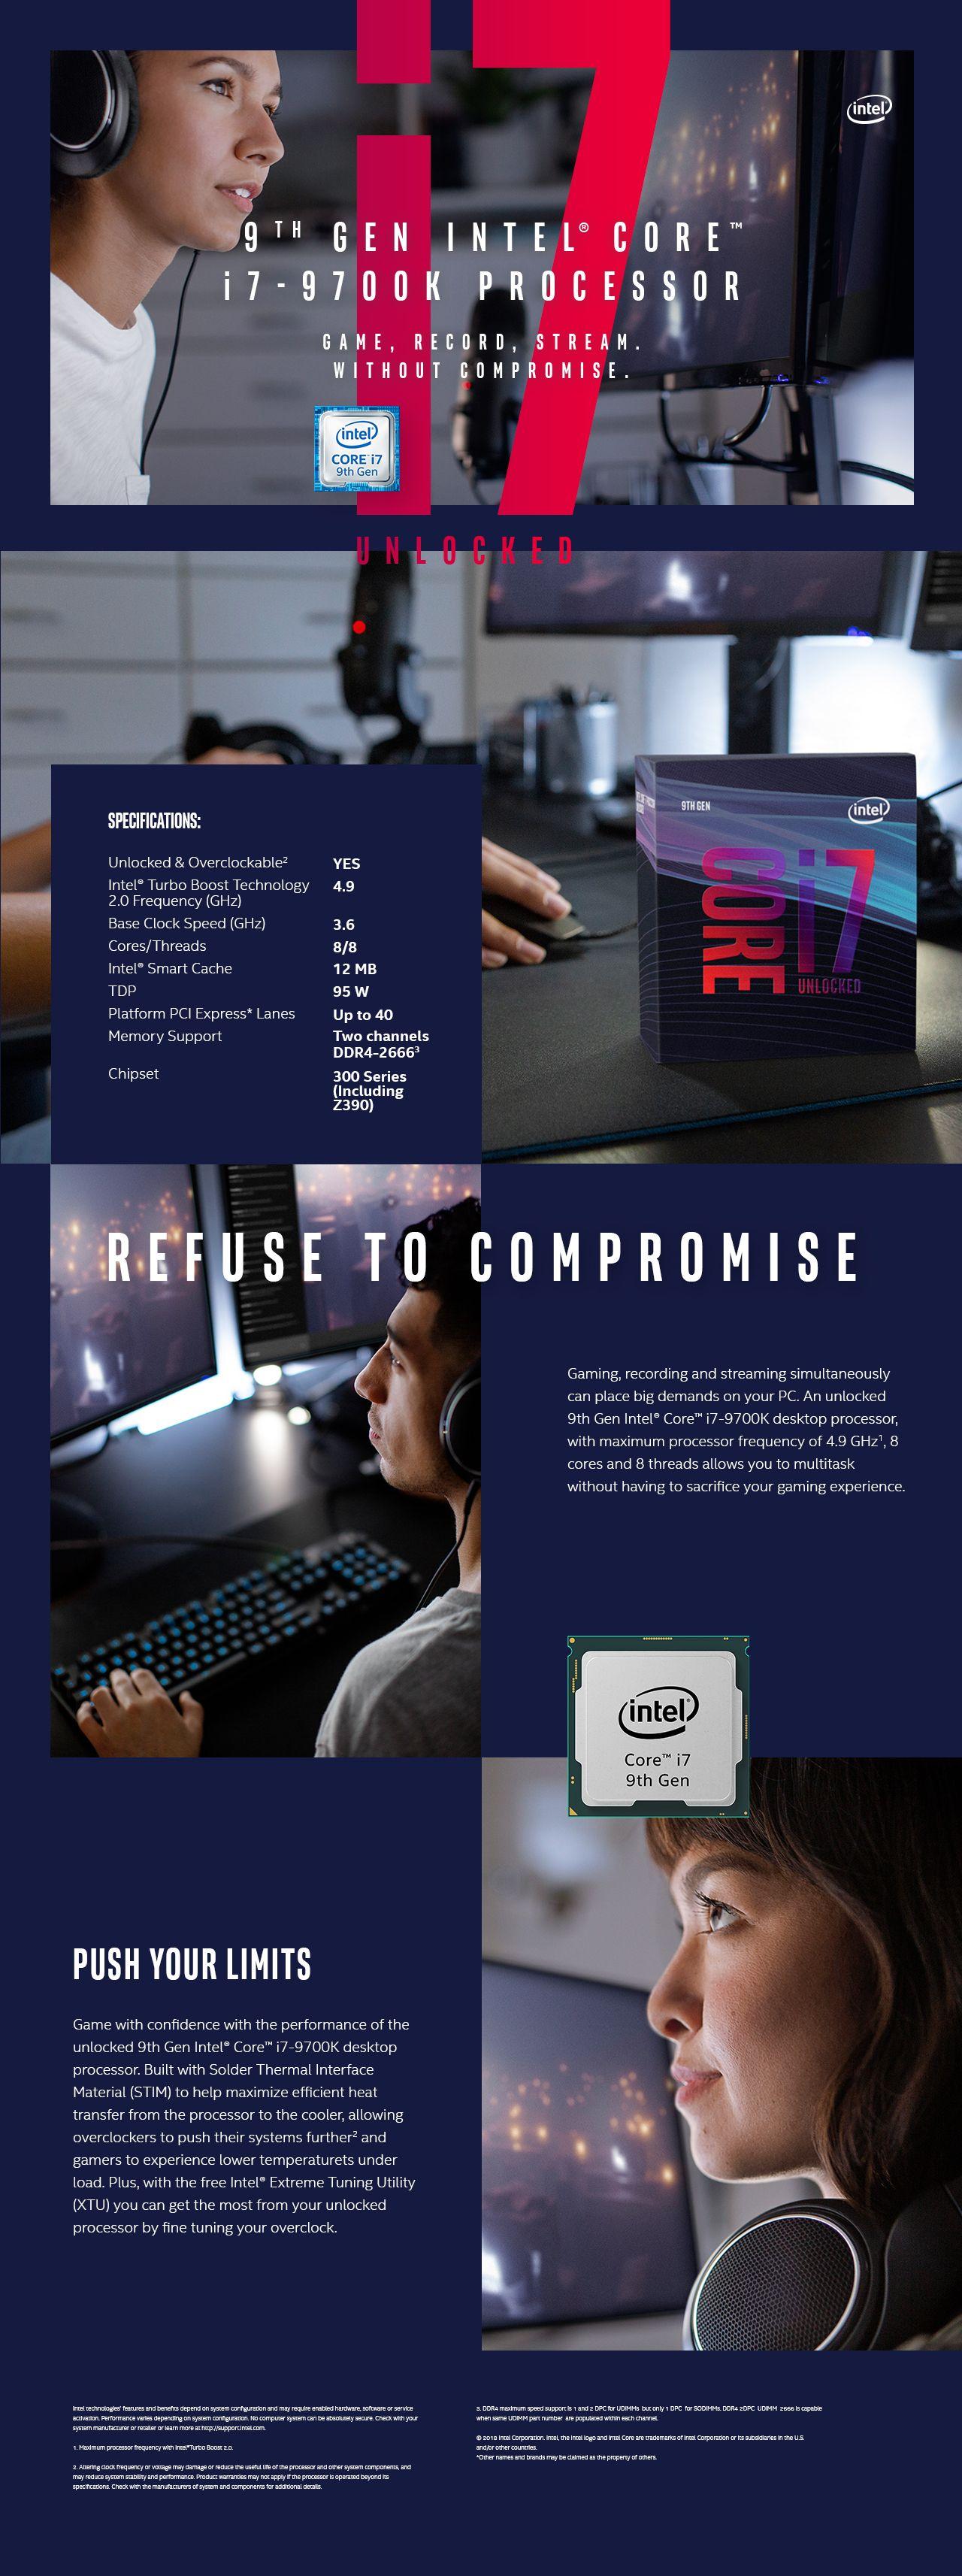 Intel Core i7-9700K Coffee Lake 8-Core 3 6 GHz (4 9 GHz Turbo) LGA 1151  (300 Series) 95W BX80684I79700K Desktop Processor Intel UHD Graphics 630 -